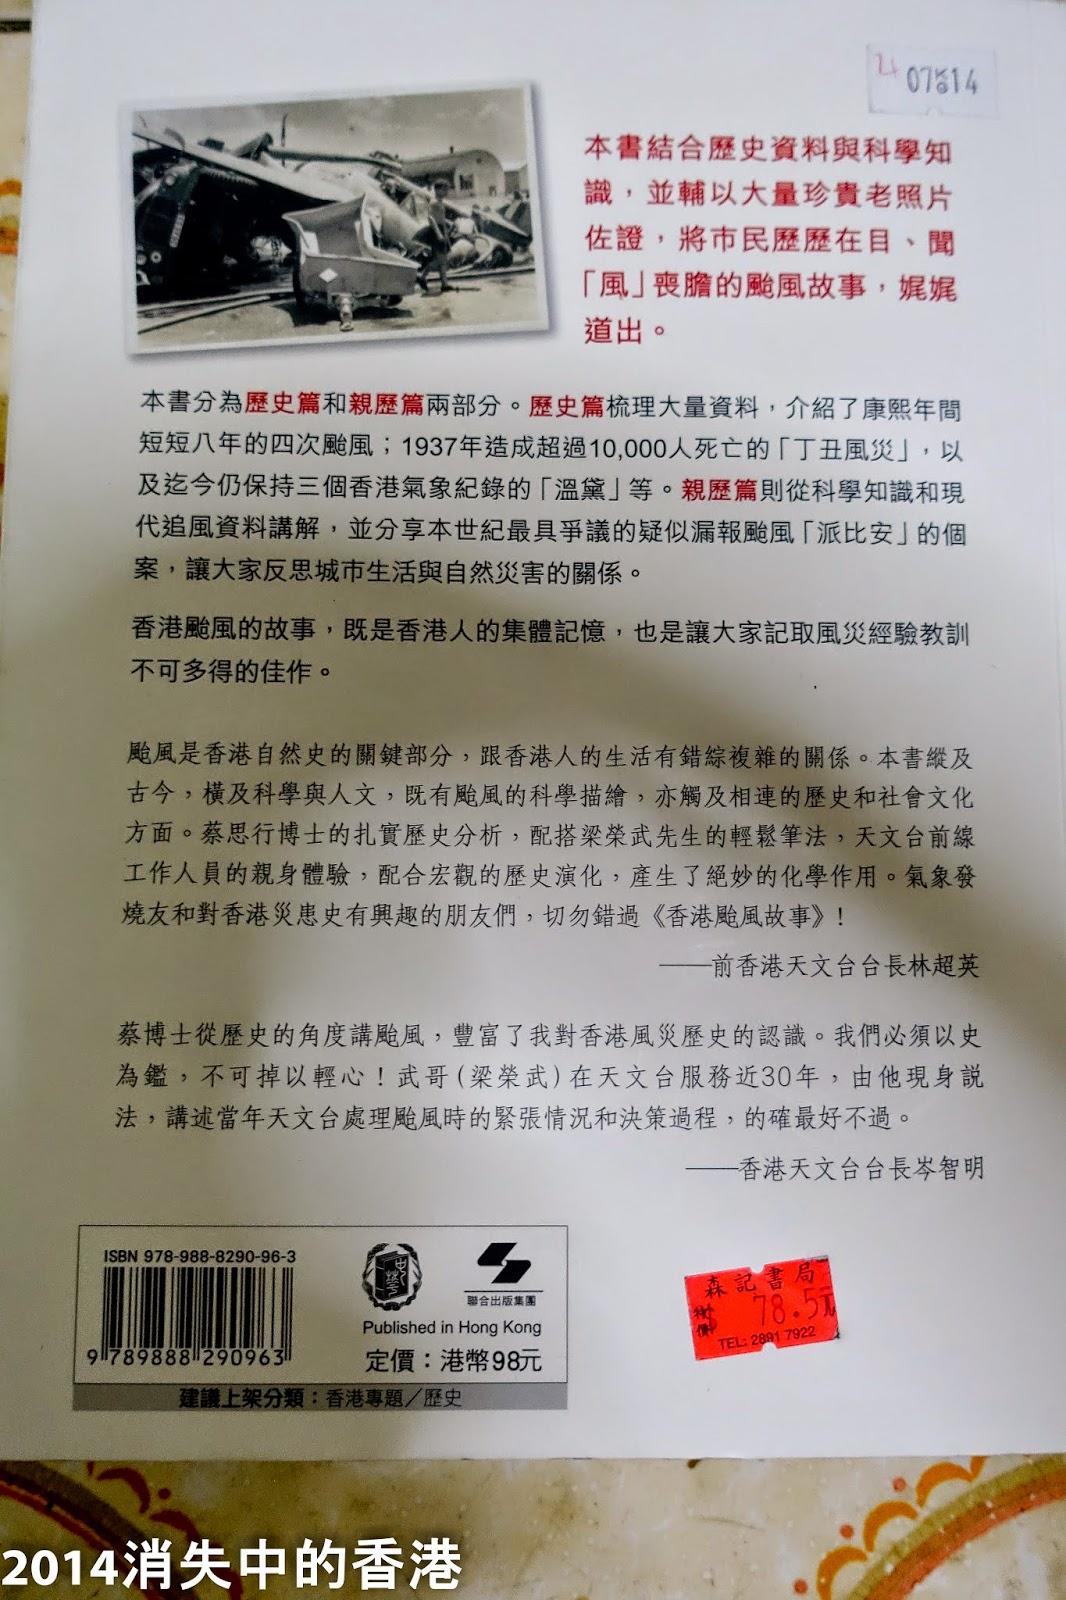 Disappearing Hong Kong/ 消失中的香港: 港•書籍-香港人集體回憶的《香港颱風故事》/ Hong Kong Books- Typhoon Collective ...